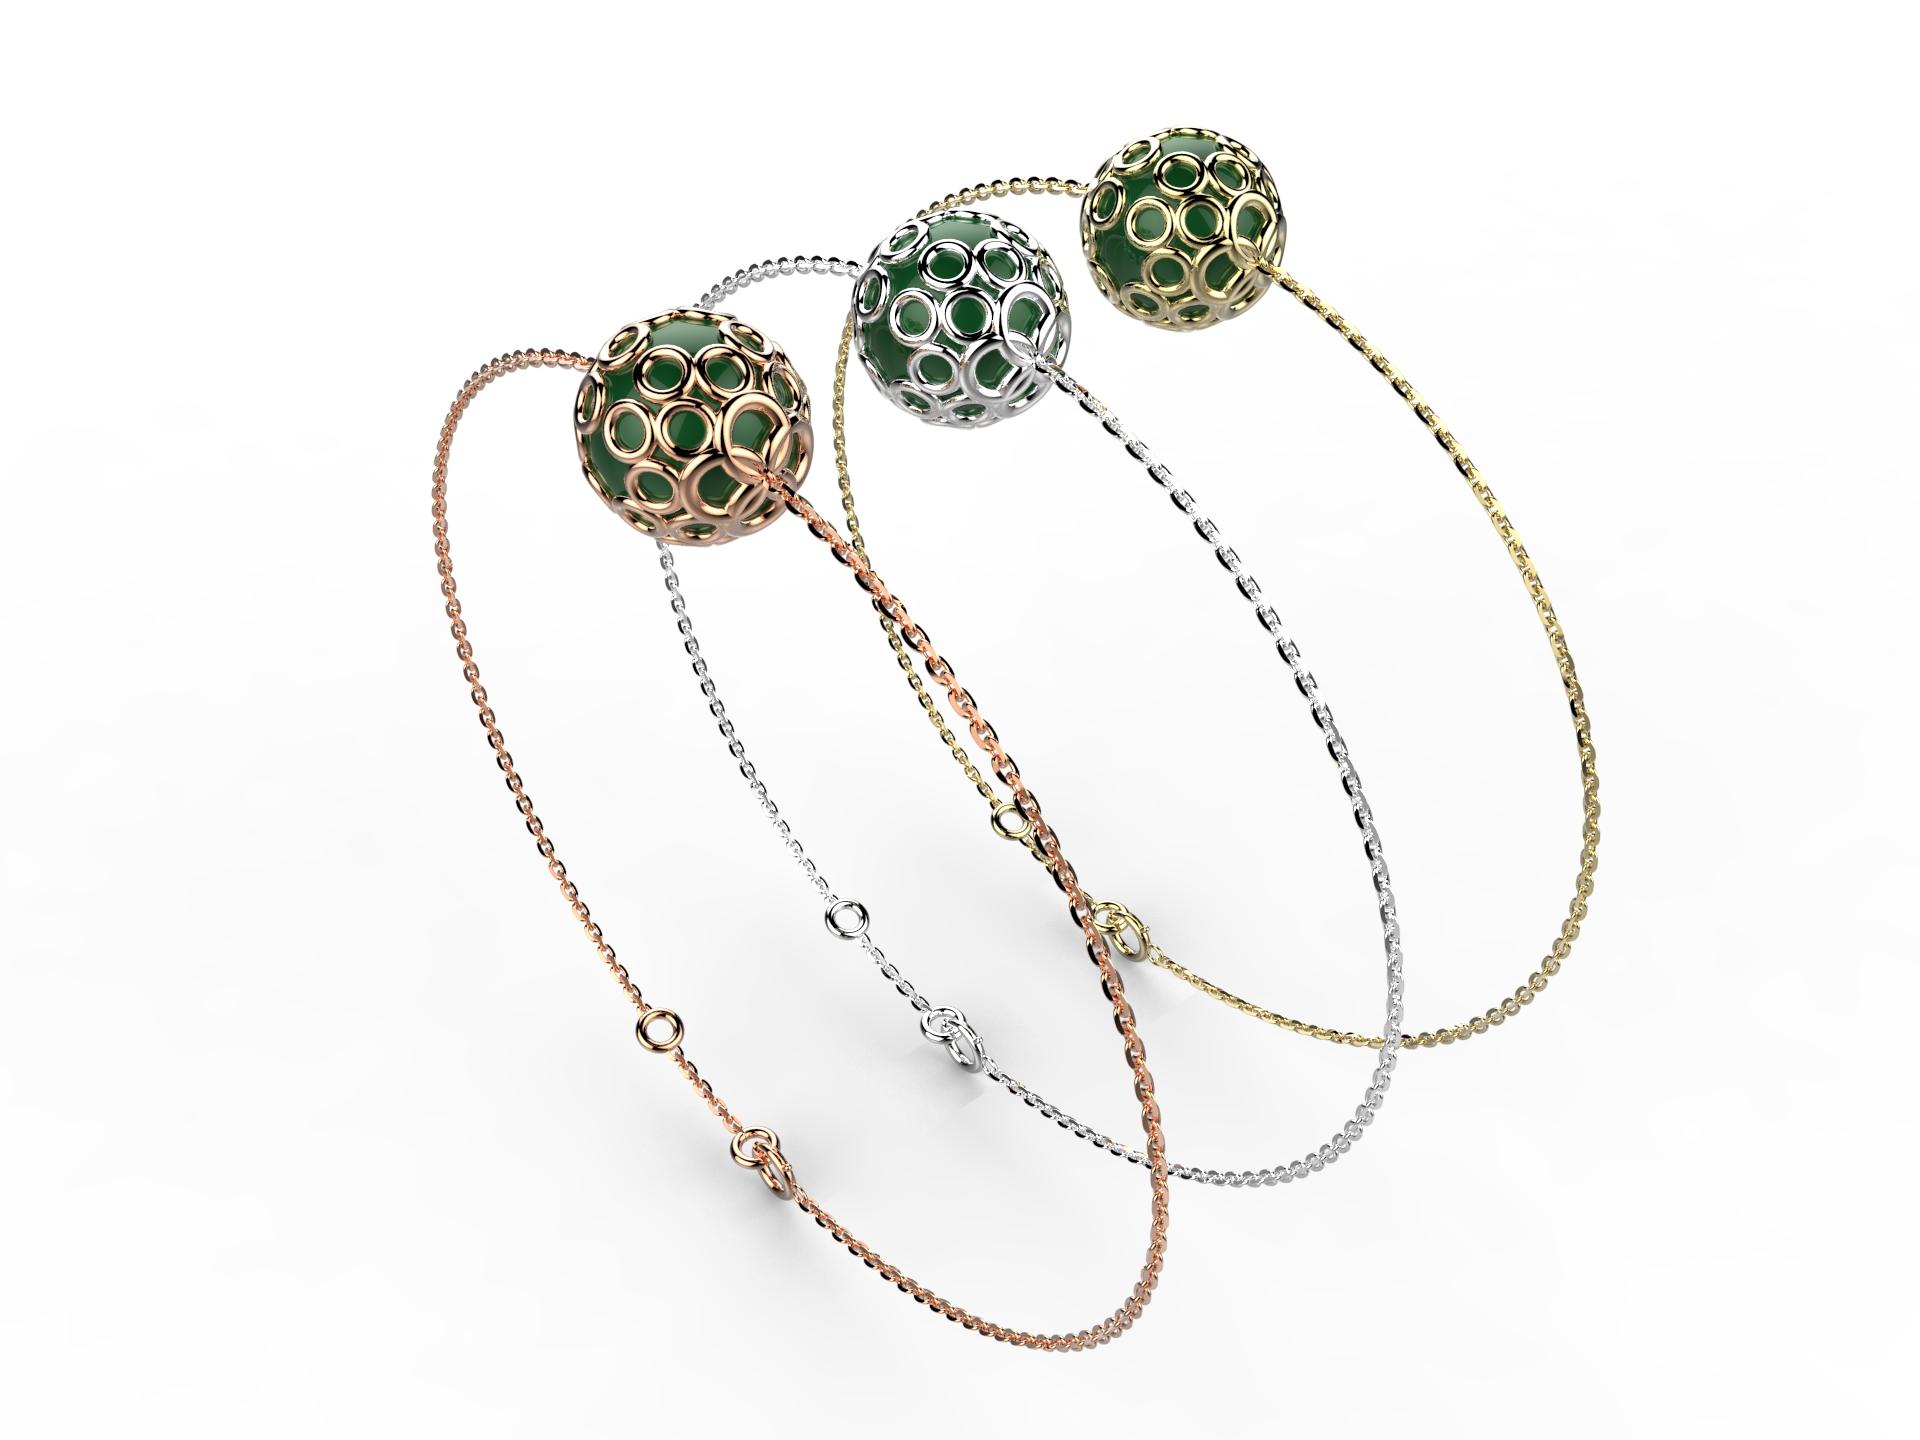 Bracelet or perle agate verte 350 €